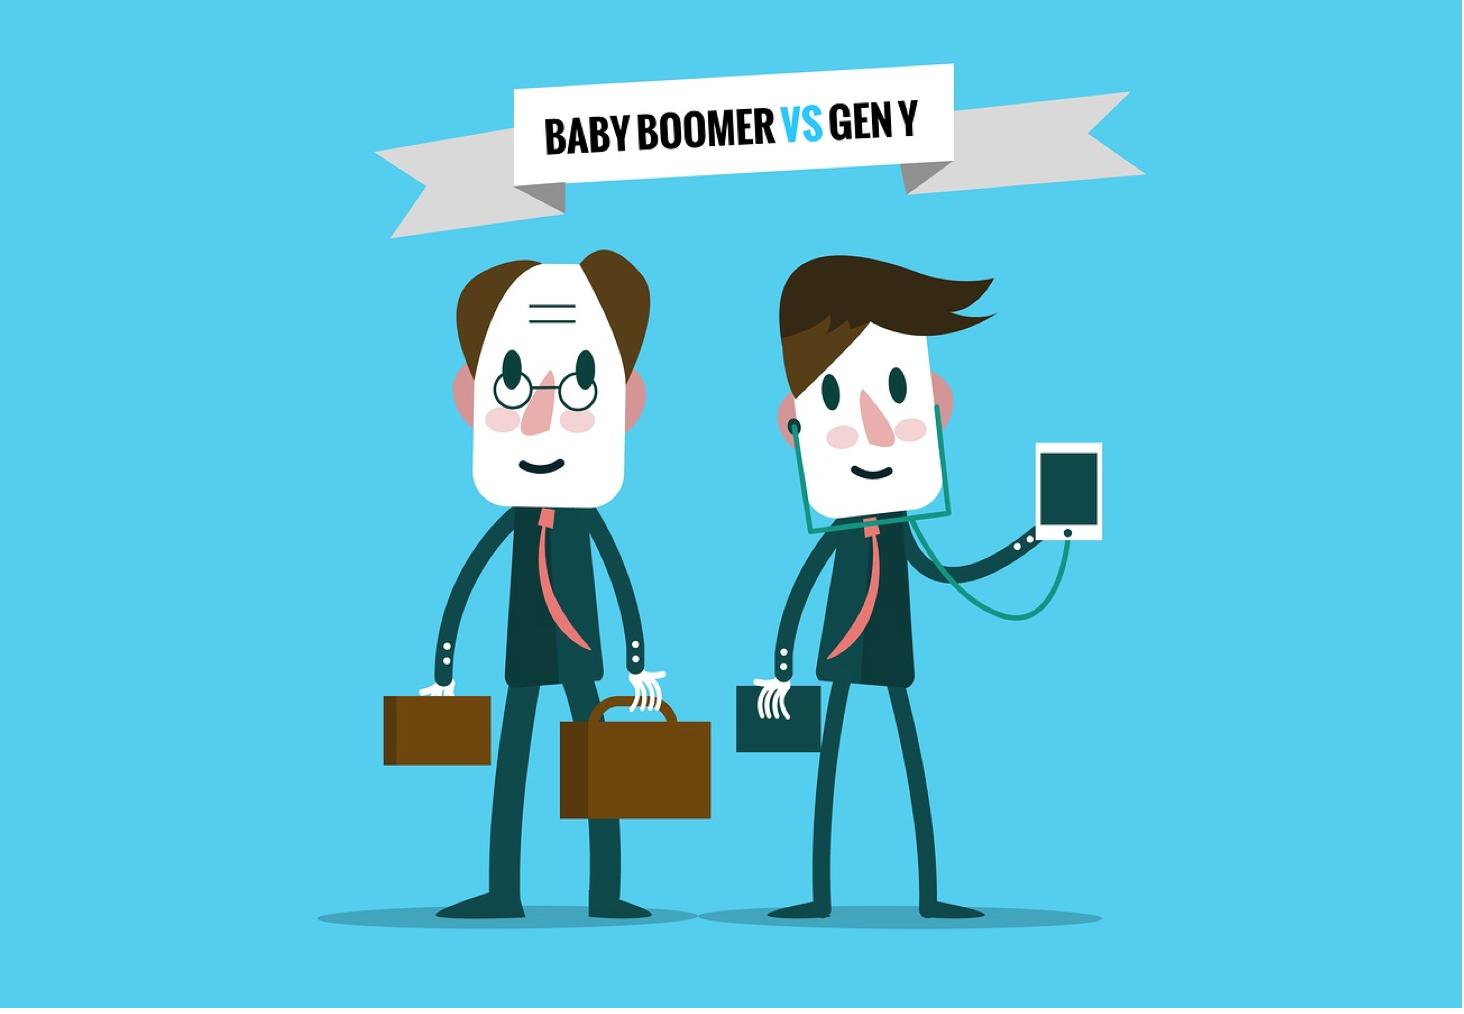 Millennials vs. Baby Boomers: Managing Across Generations